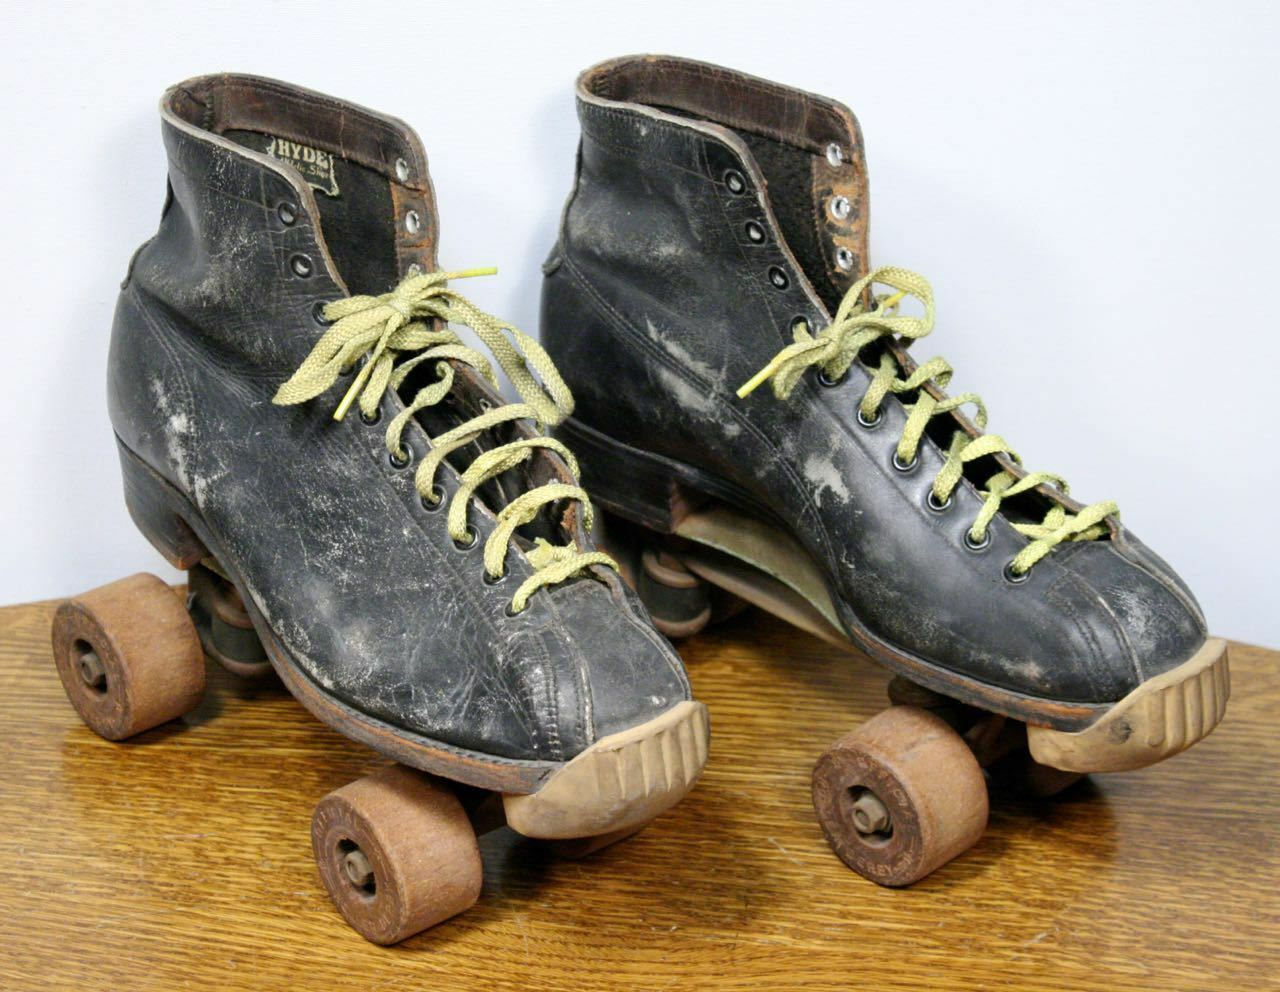 Vintage HYDE Leer Roller rolschaatsen.Officiële Roller Derby mannens Sz.8 Houtwielen